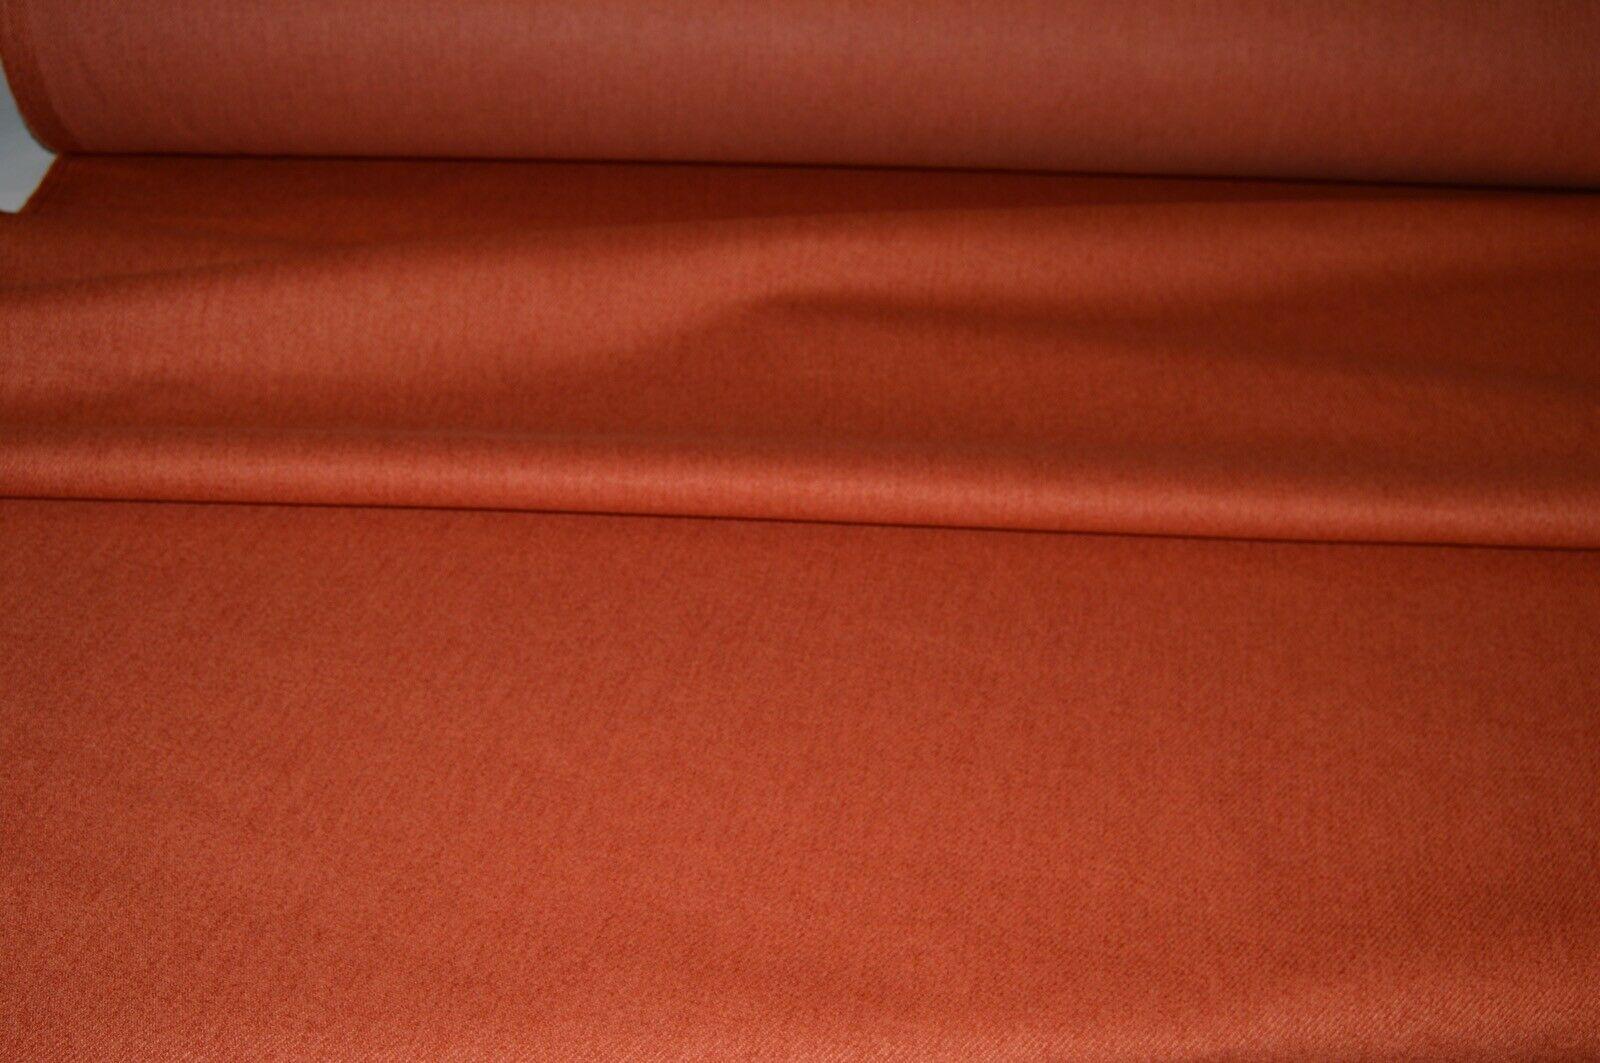 Cushion Fabric Caravan Burnt Orange//Green//Cream Check Chenille Upholstery